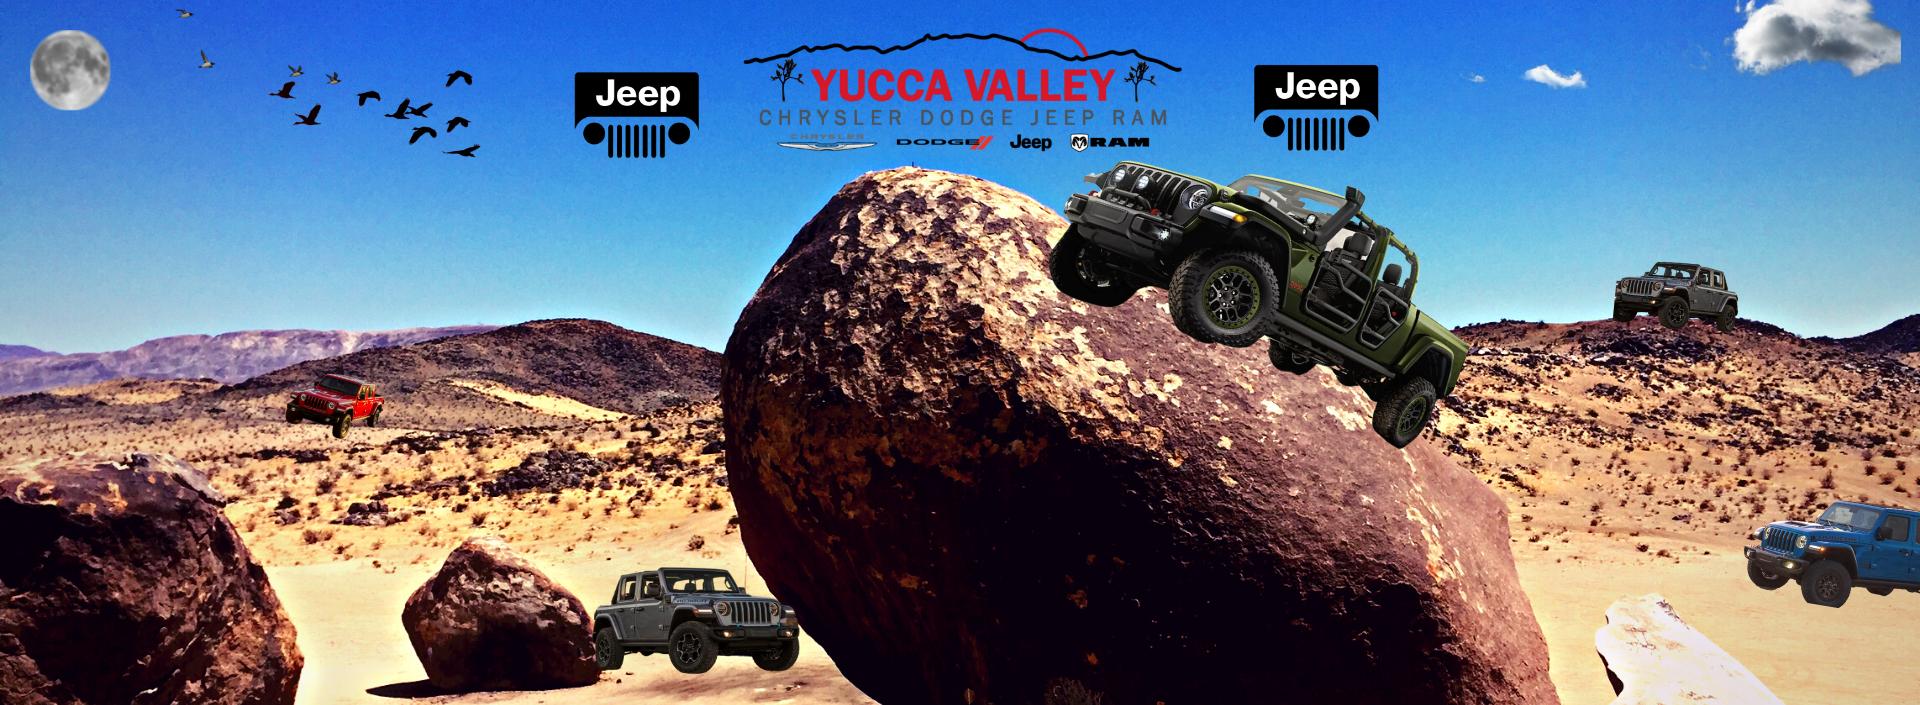 Giat Rock Jeep 1920×705